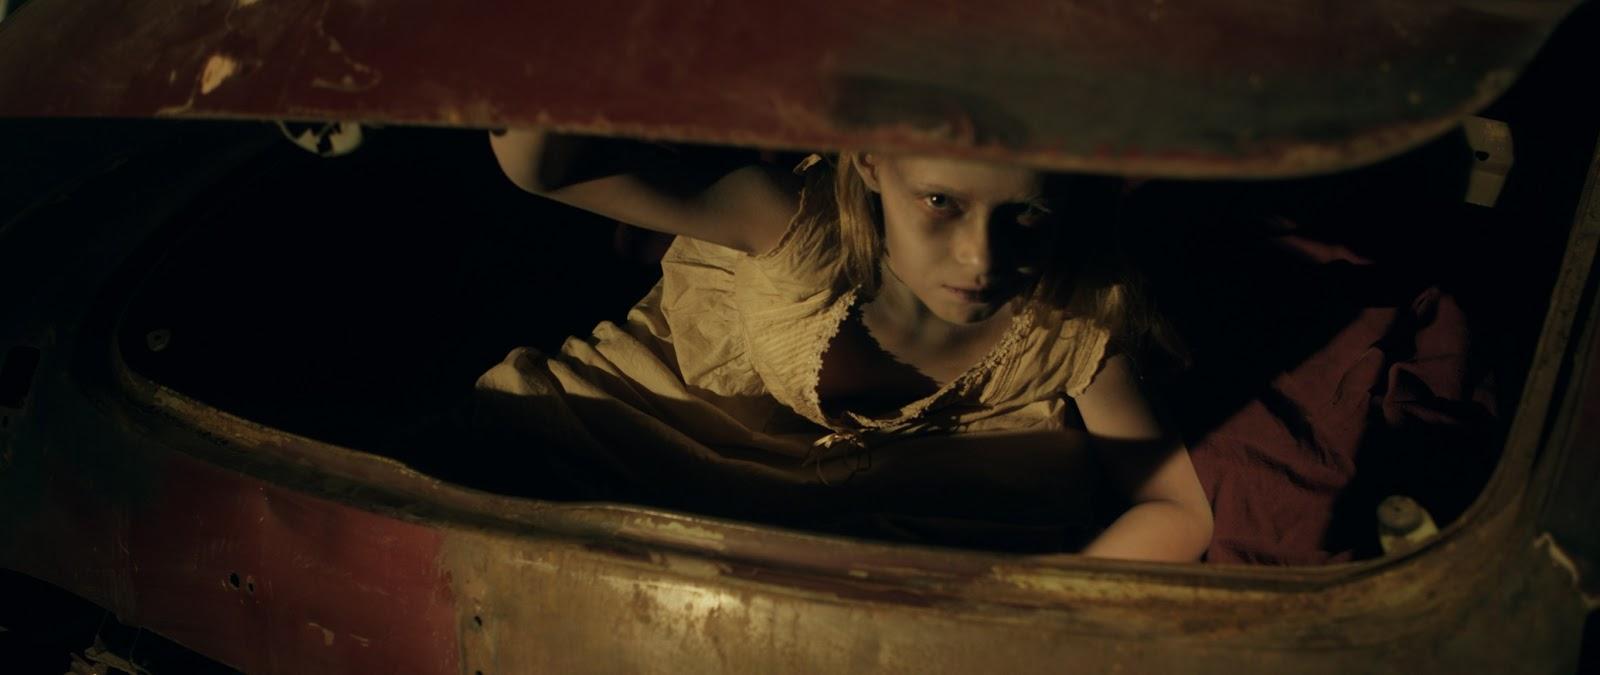 Ghost girl in Trunk